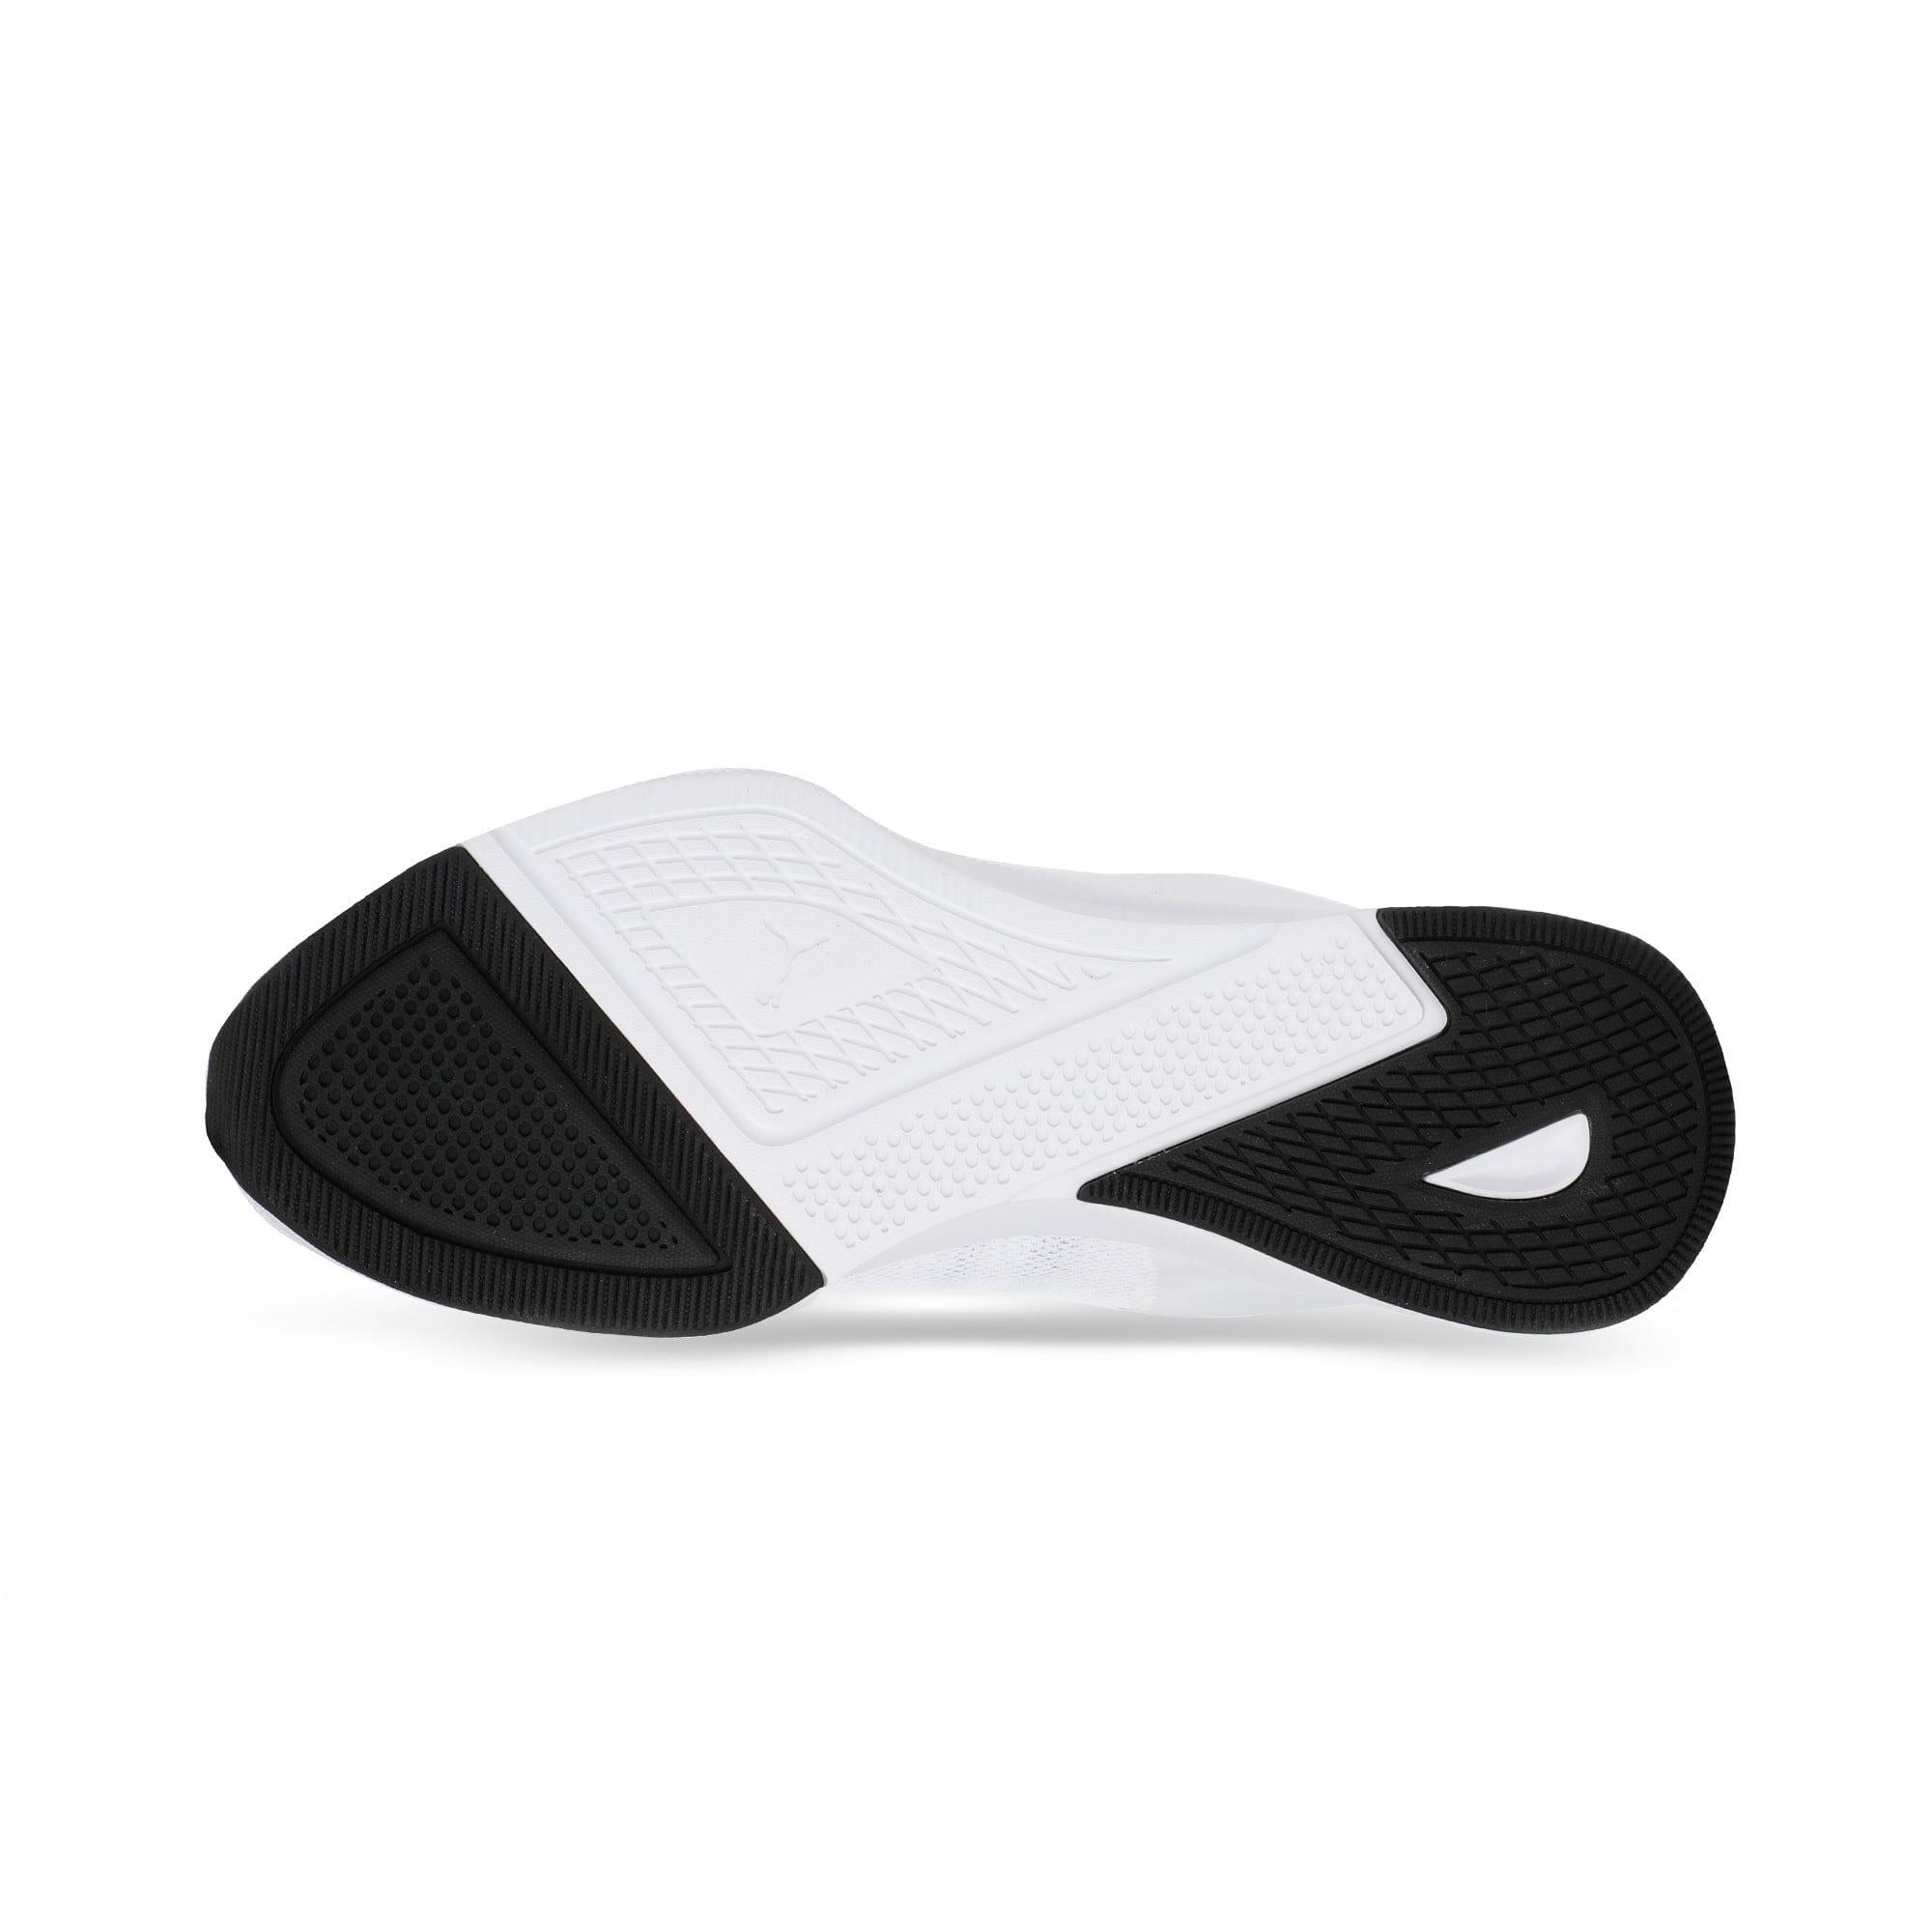 Thumbnail 4 of Flyer Modern Running Shoes, Puma White-Puma Black, medium-IND